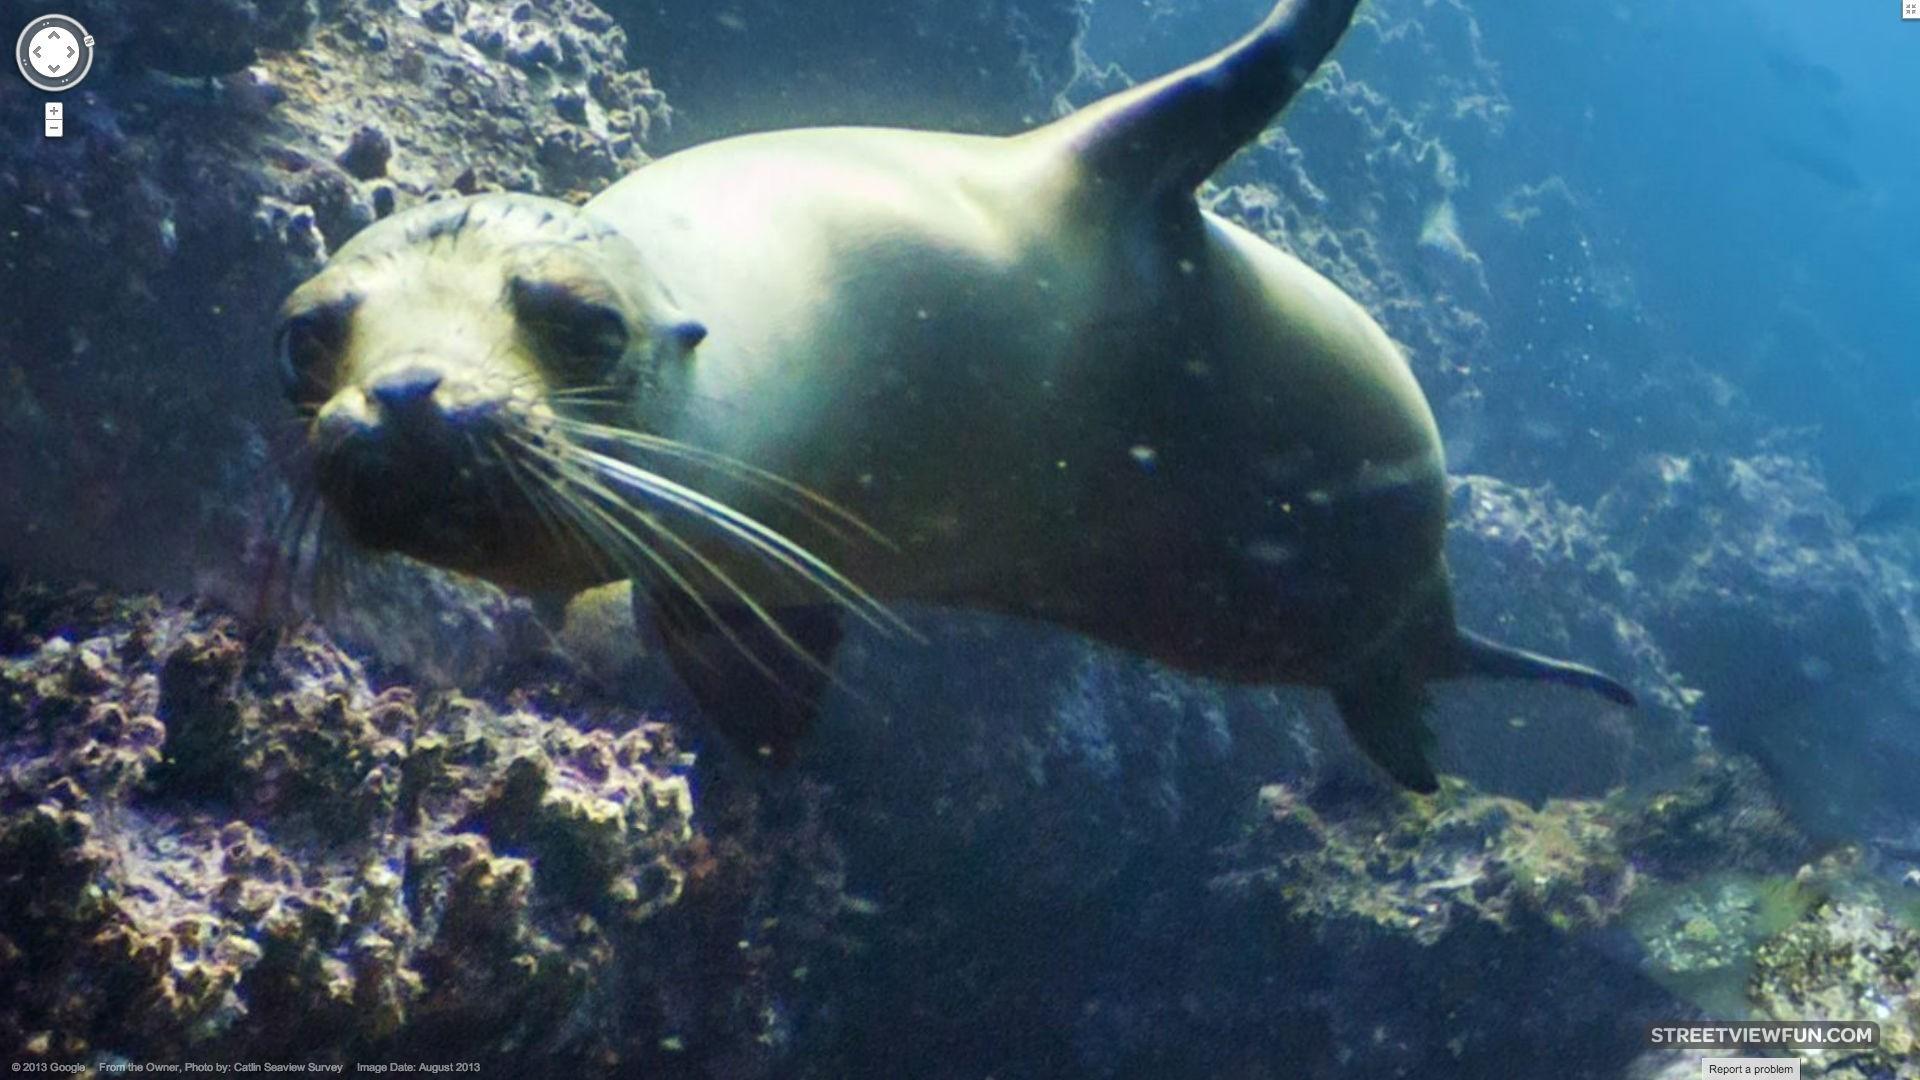 Streetviewfun Galapagos Sea Lion Playing With Street View